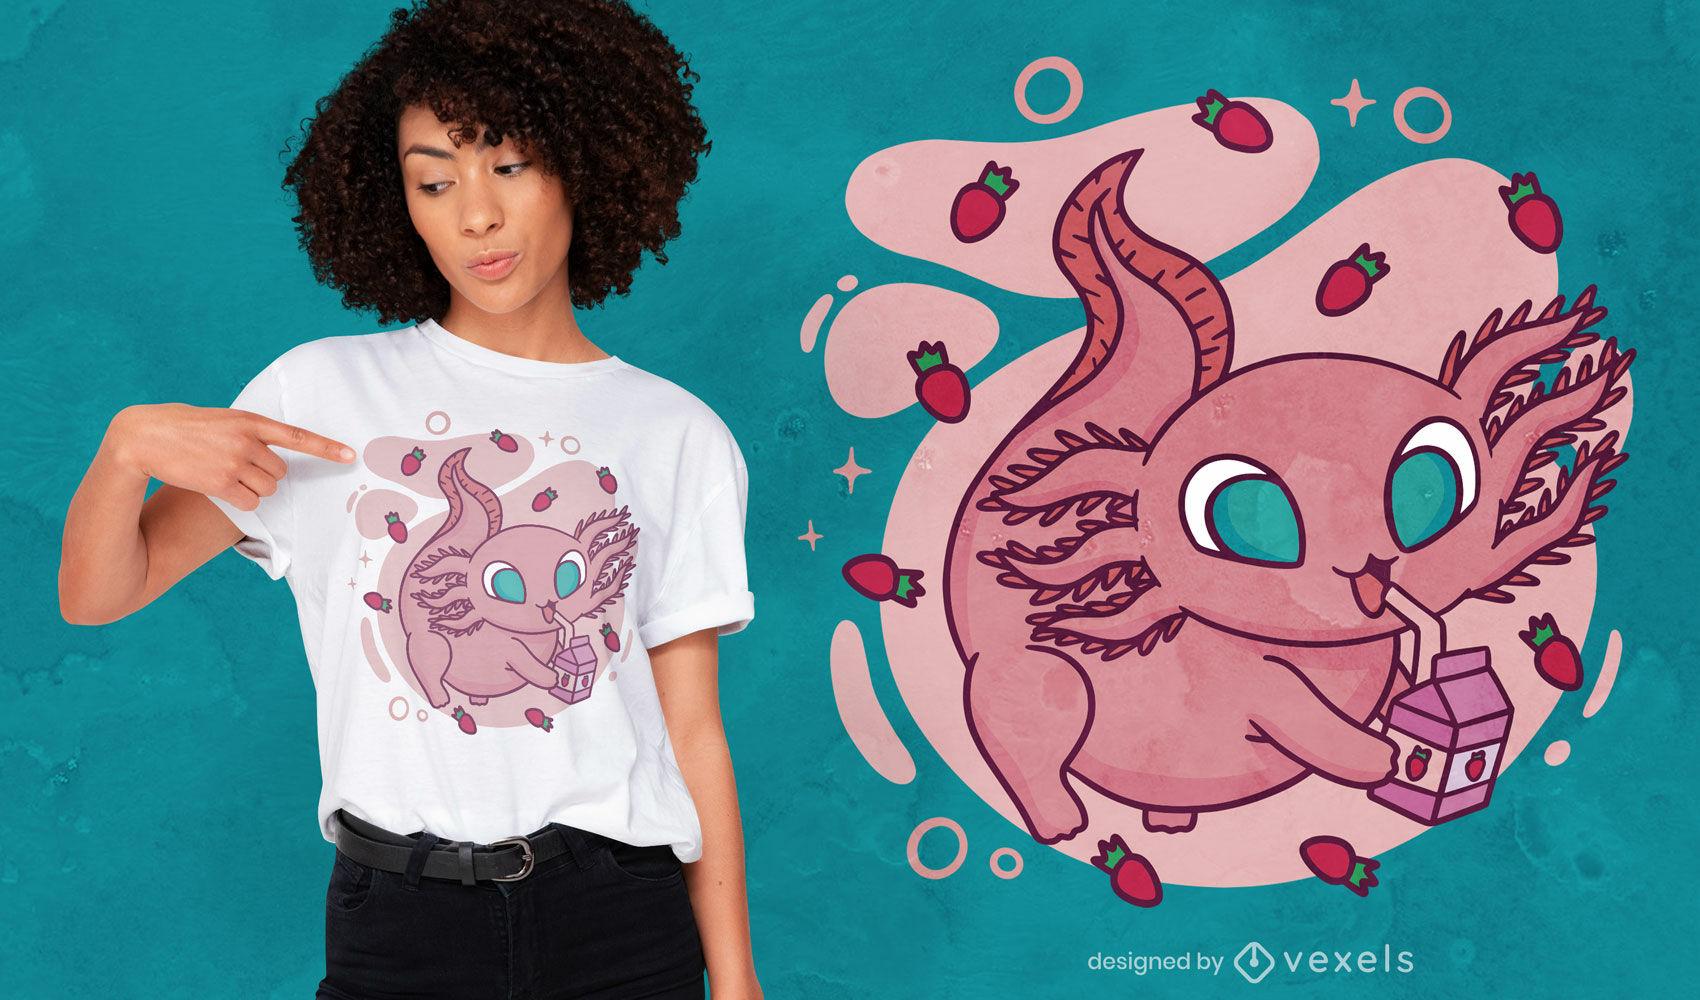 Lindo dise?o de camiseta de axolotl bebiendo millk